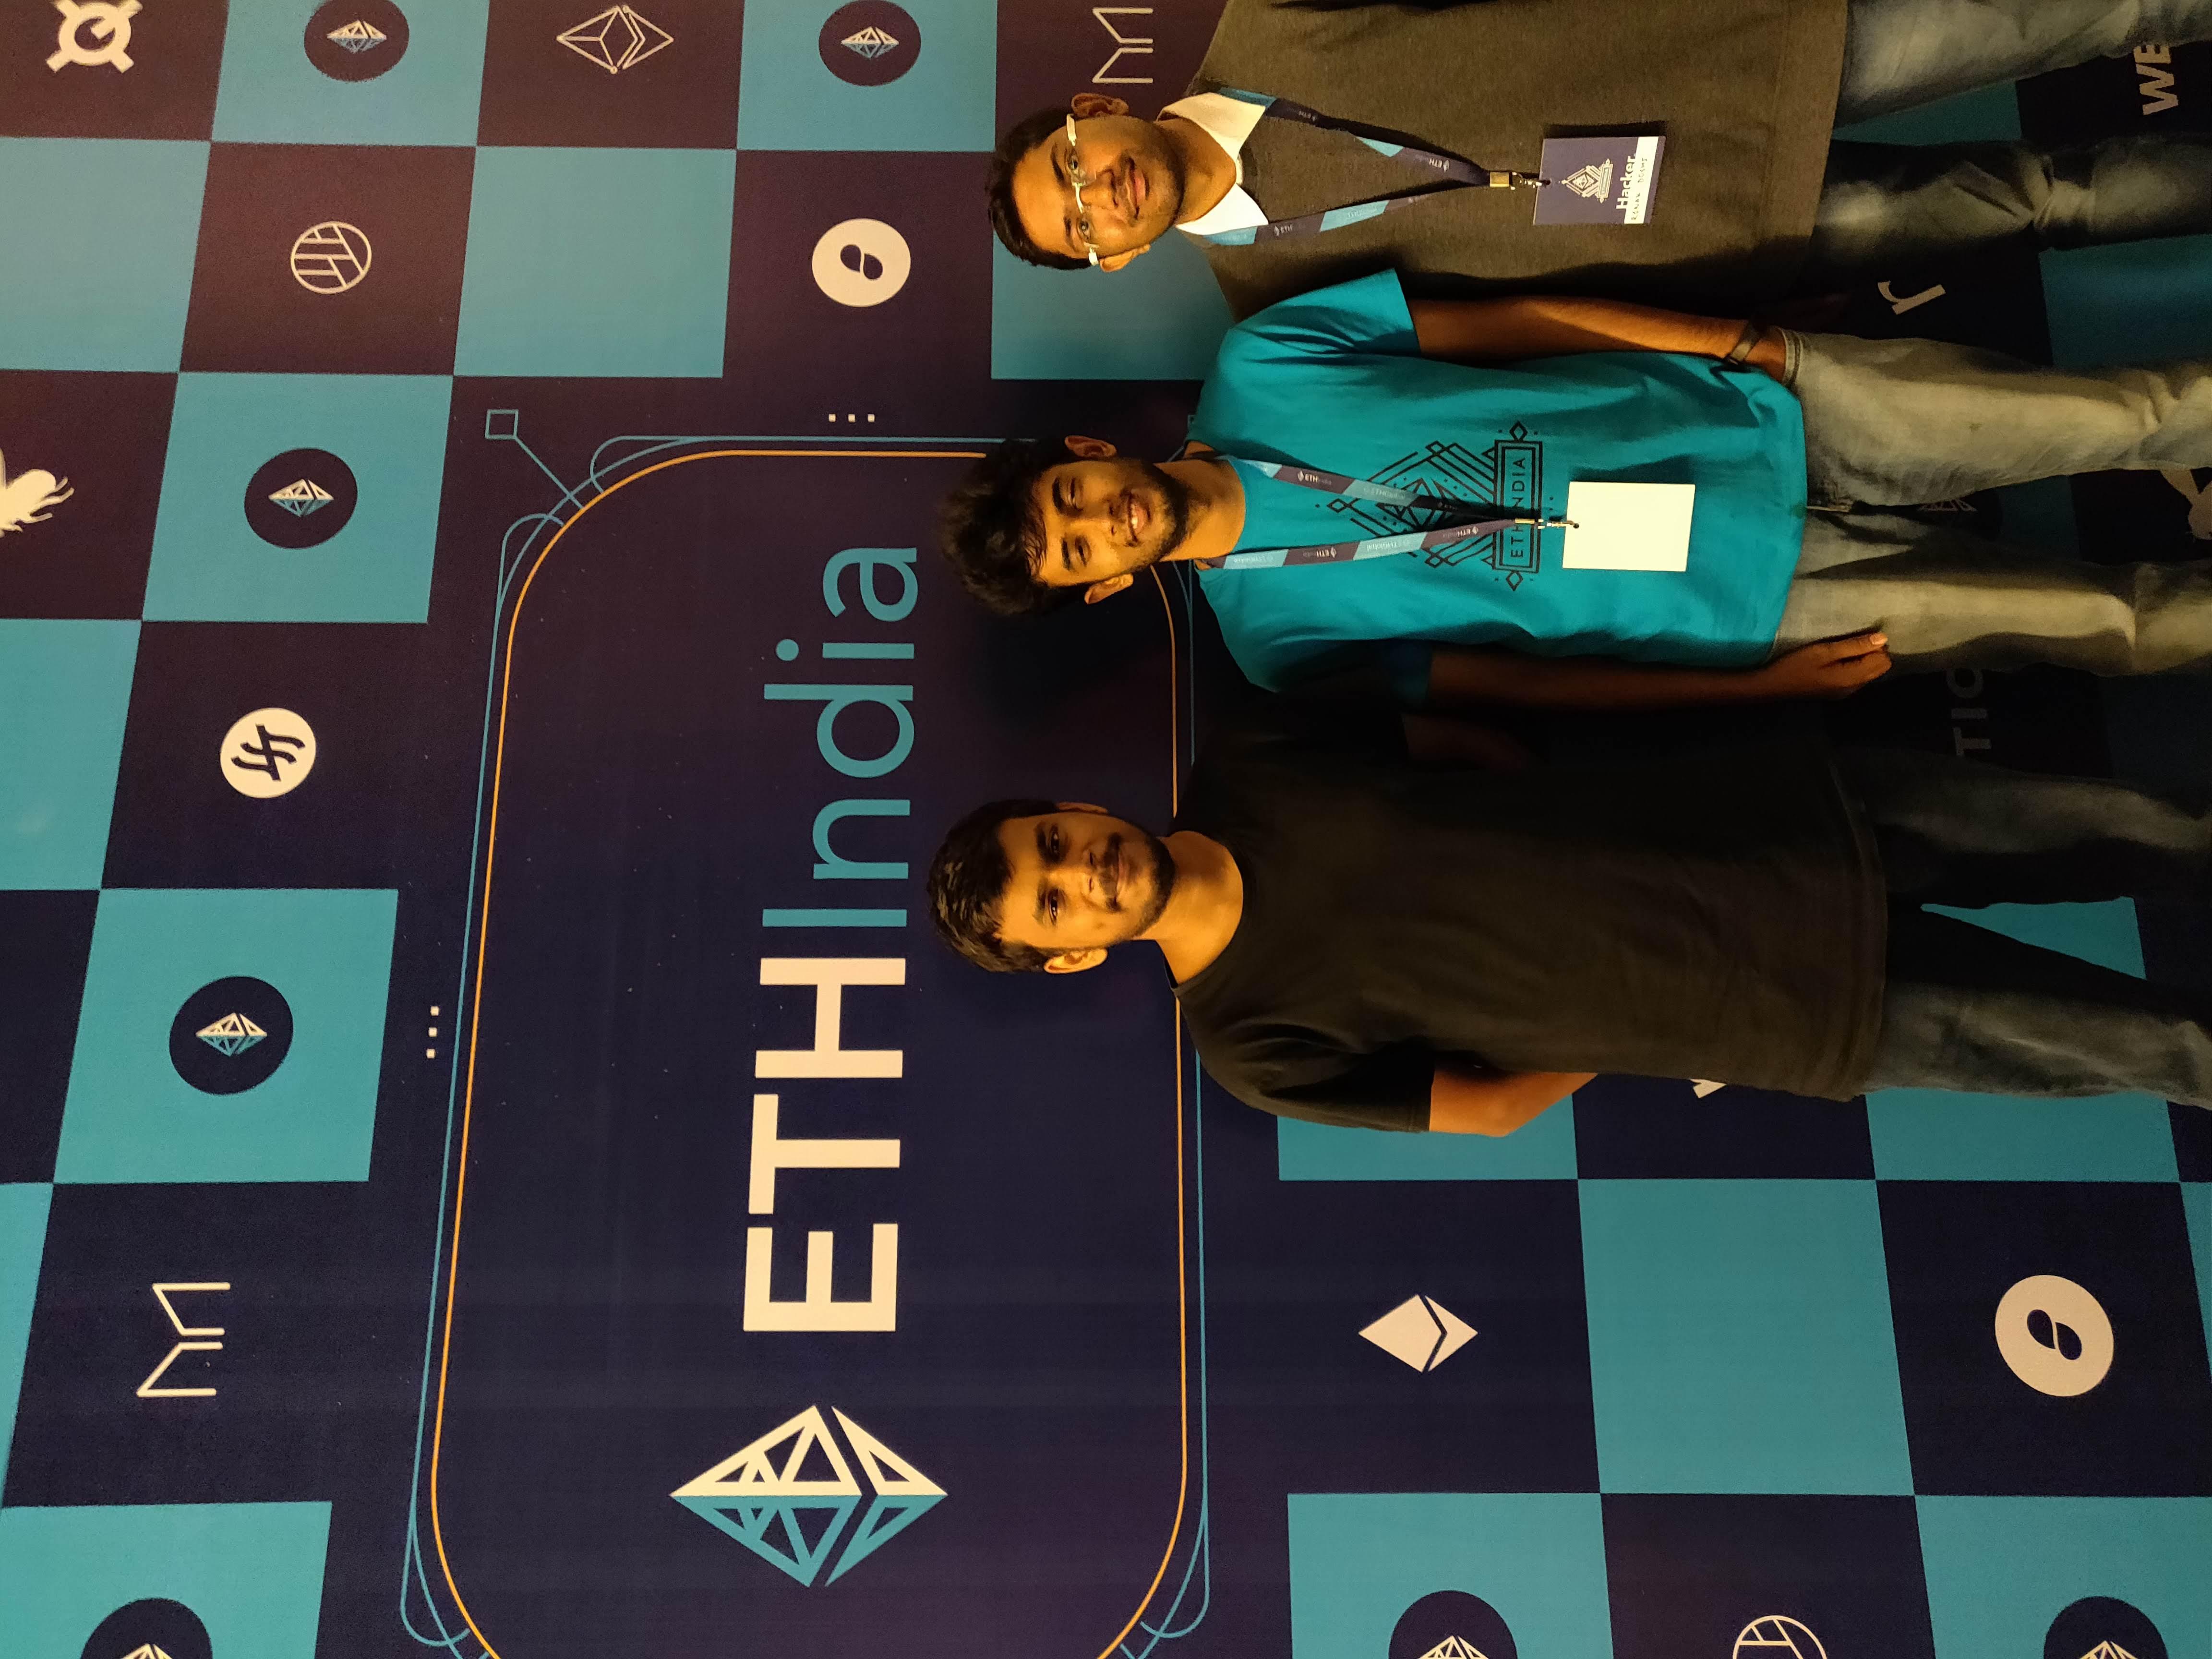 Whistle - A decentralised app for Whistleblowers developed as a part of EthIndia 2018 Hackathon at Bangaluru, India. - Whistle-一个为告密者开发的分散应用程序,作为印度班加罗鲁2018年EthIndia Hackathon的一部分。